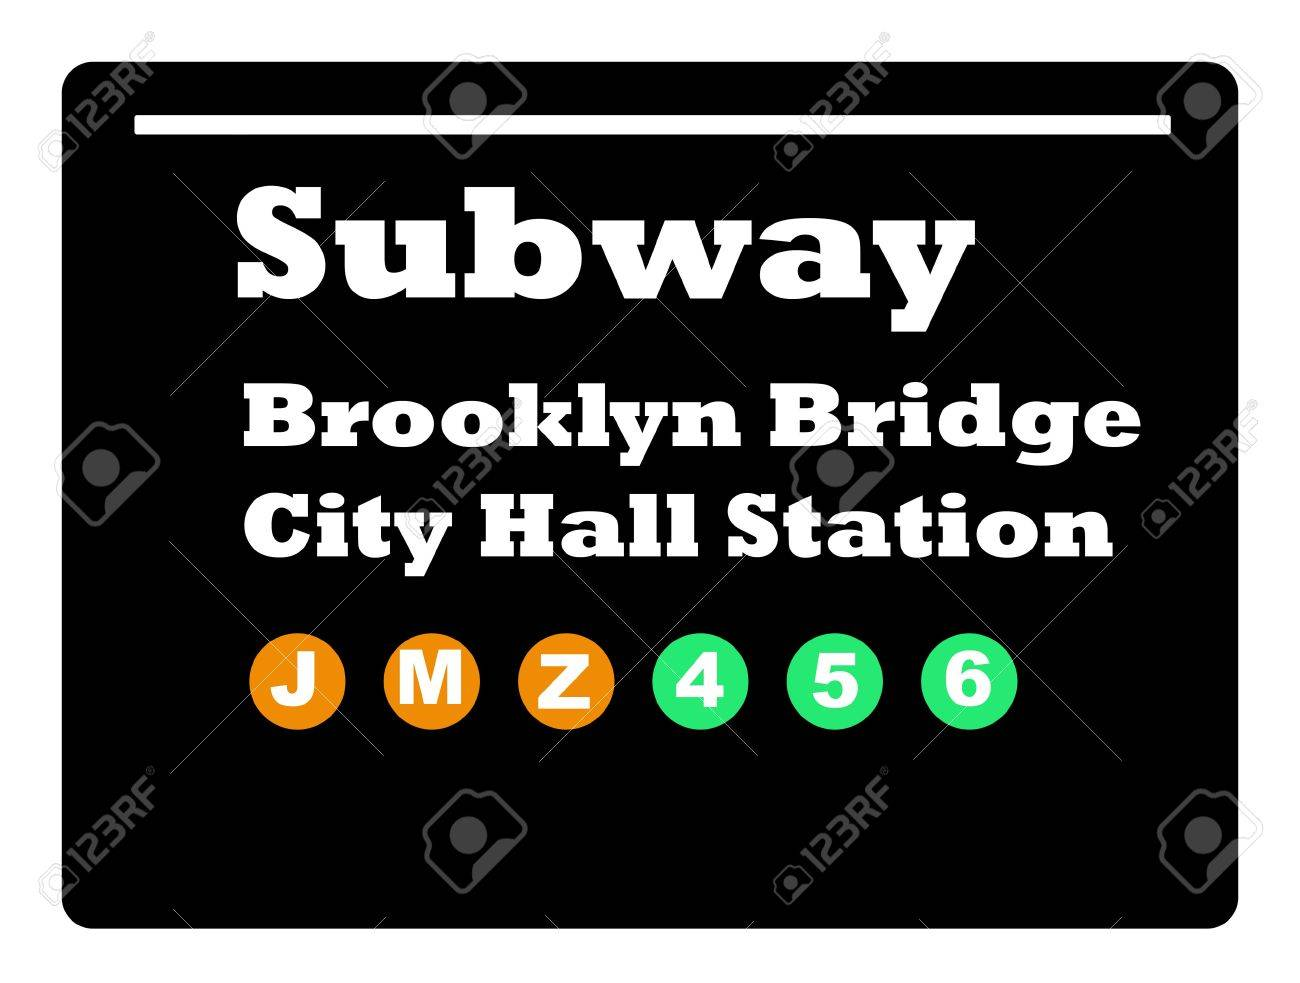 Brookly Bridge City Hall Station subway train sign isolated on black background. Stock Photo - 5416026